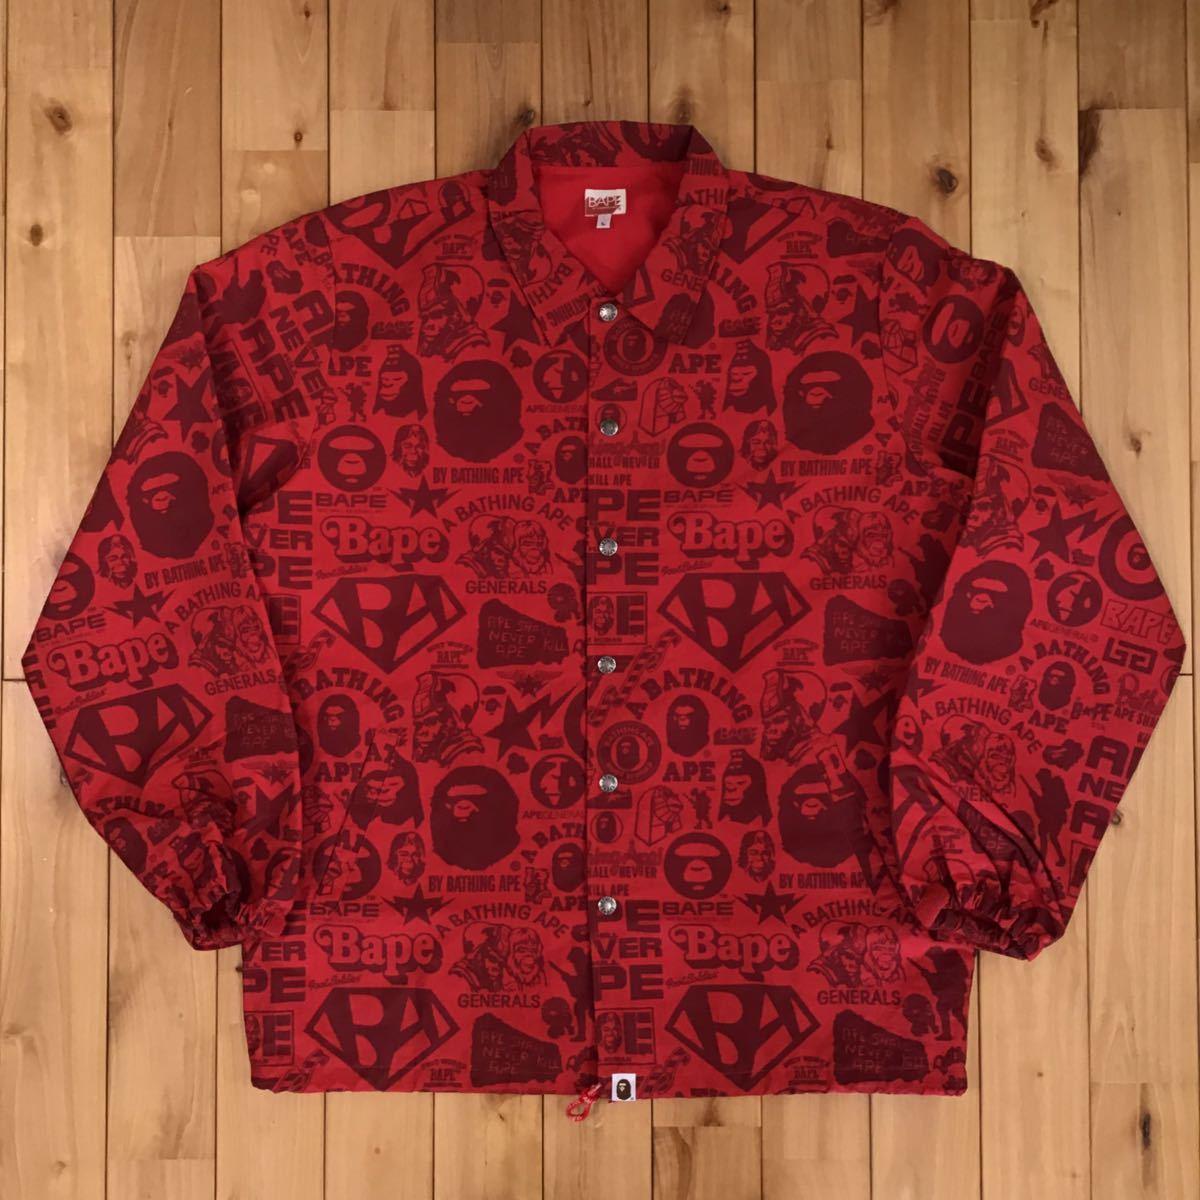 MIX LOGO コーチジャケット Lサイズ a bathing ape BAPE coach jacket red エイプ ベイプ アベイシングエイプ 5570